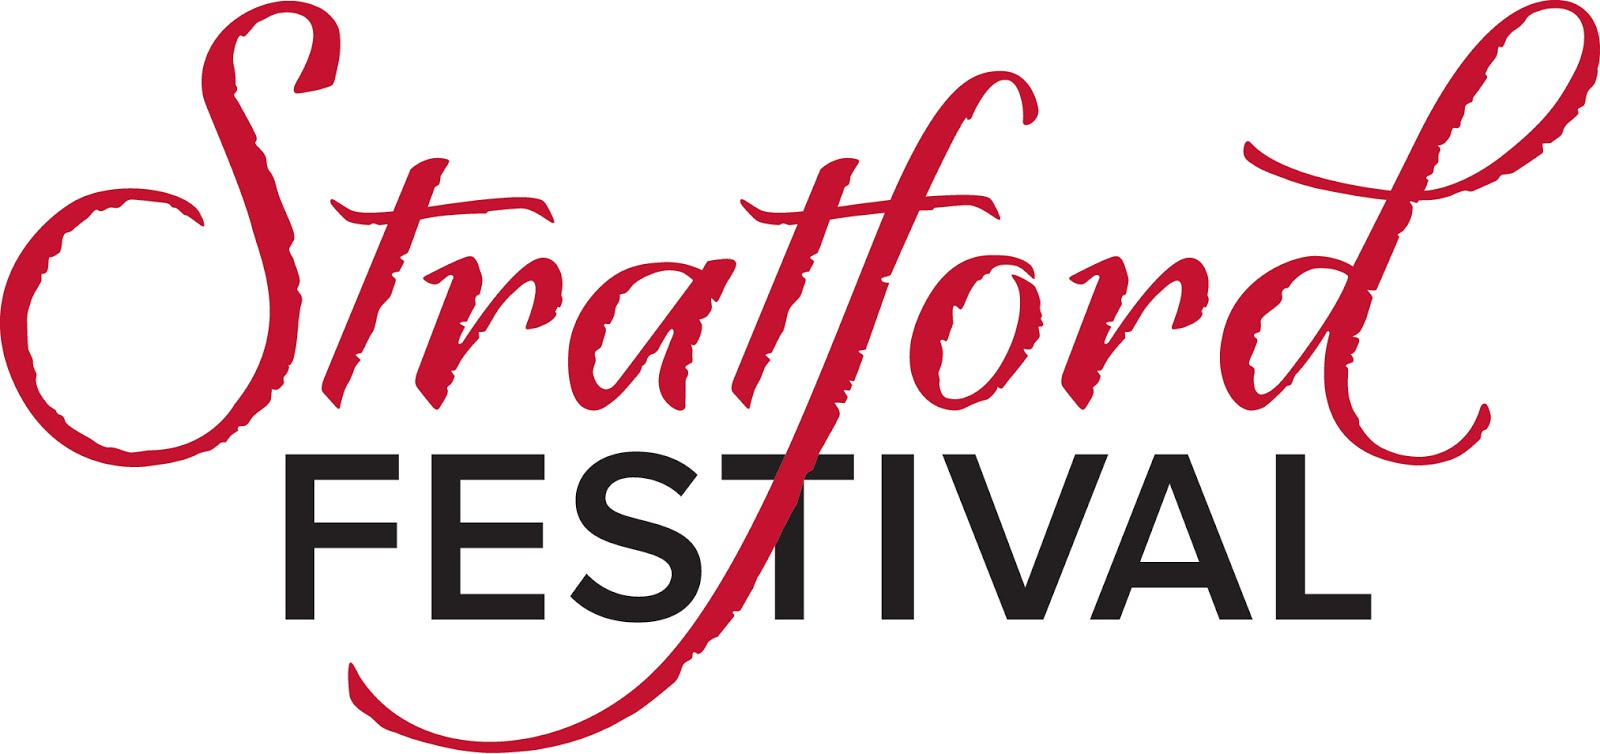 Stratford Festival 2017